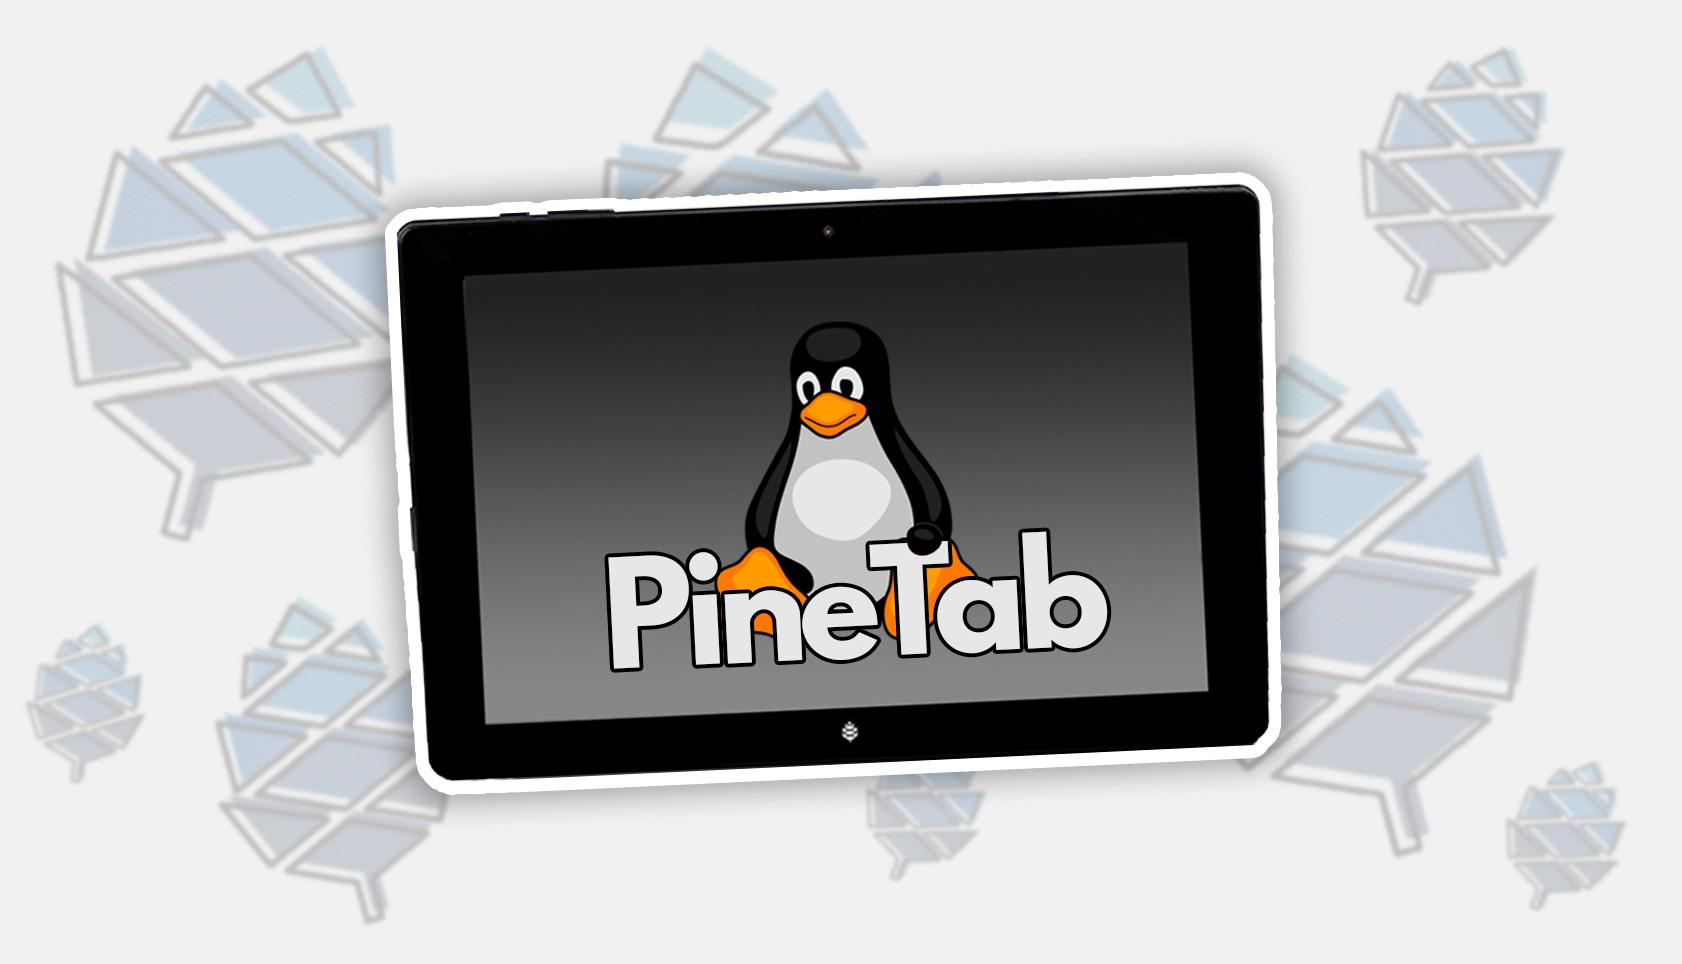 pinetab linux tablet